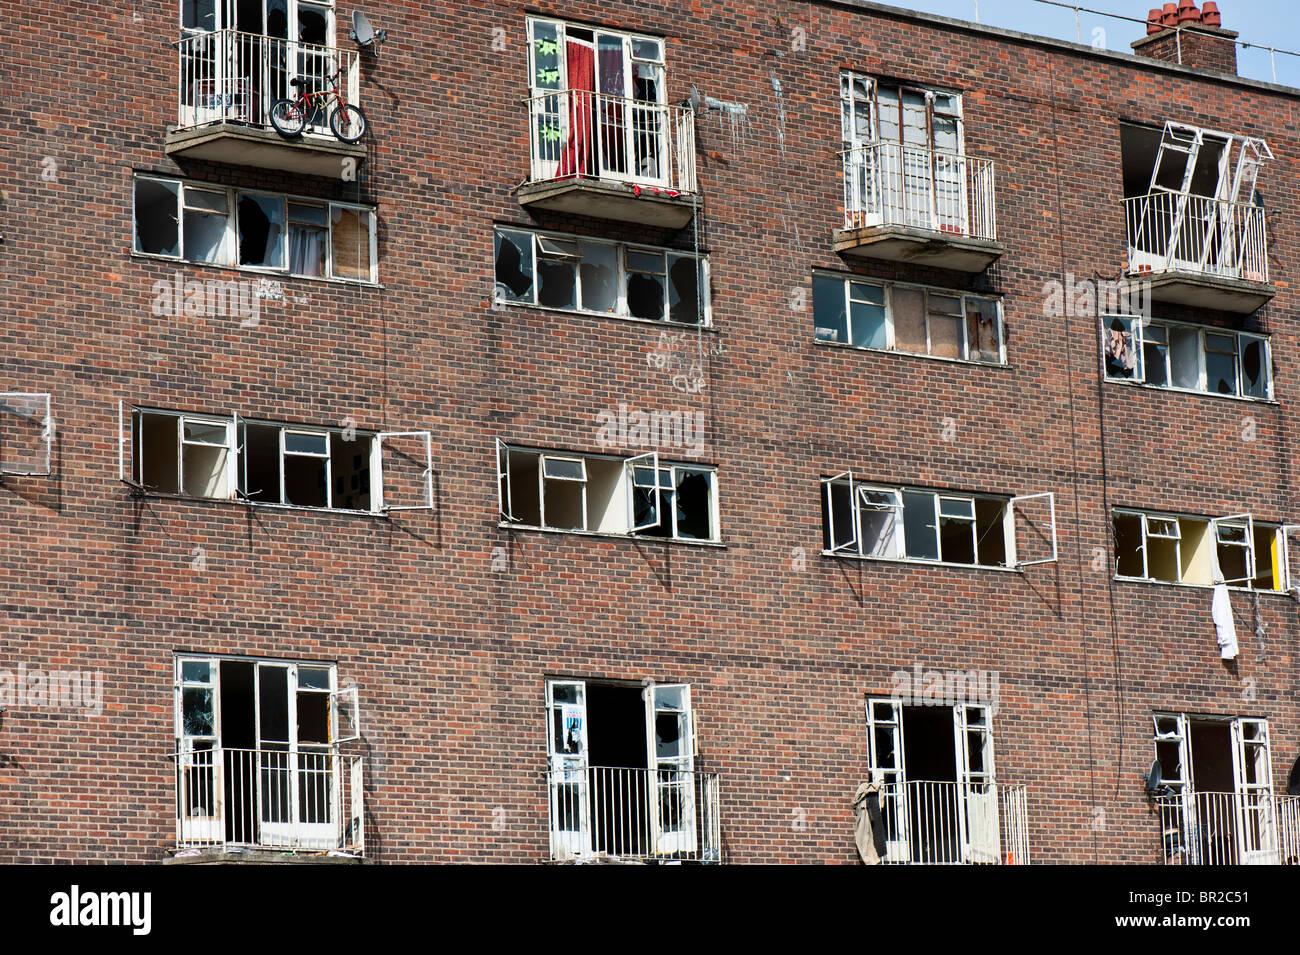 Housing estate destined for regeneration, Hackney, London, United Kingdom - Stock Image